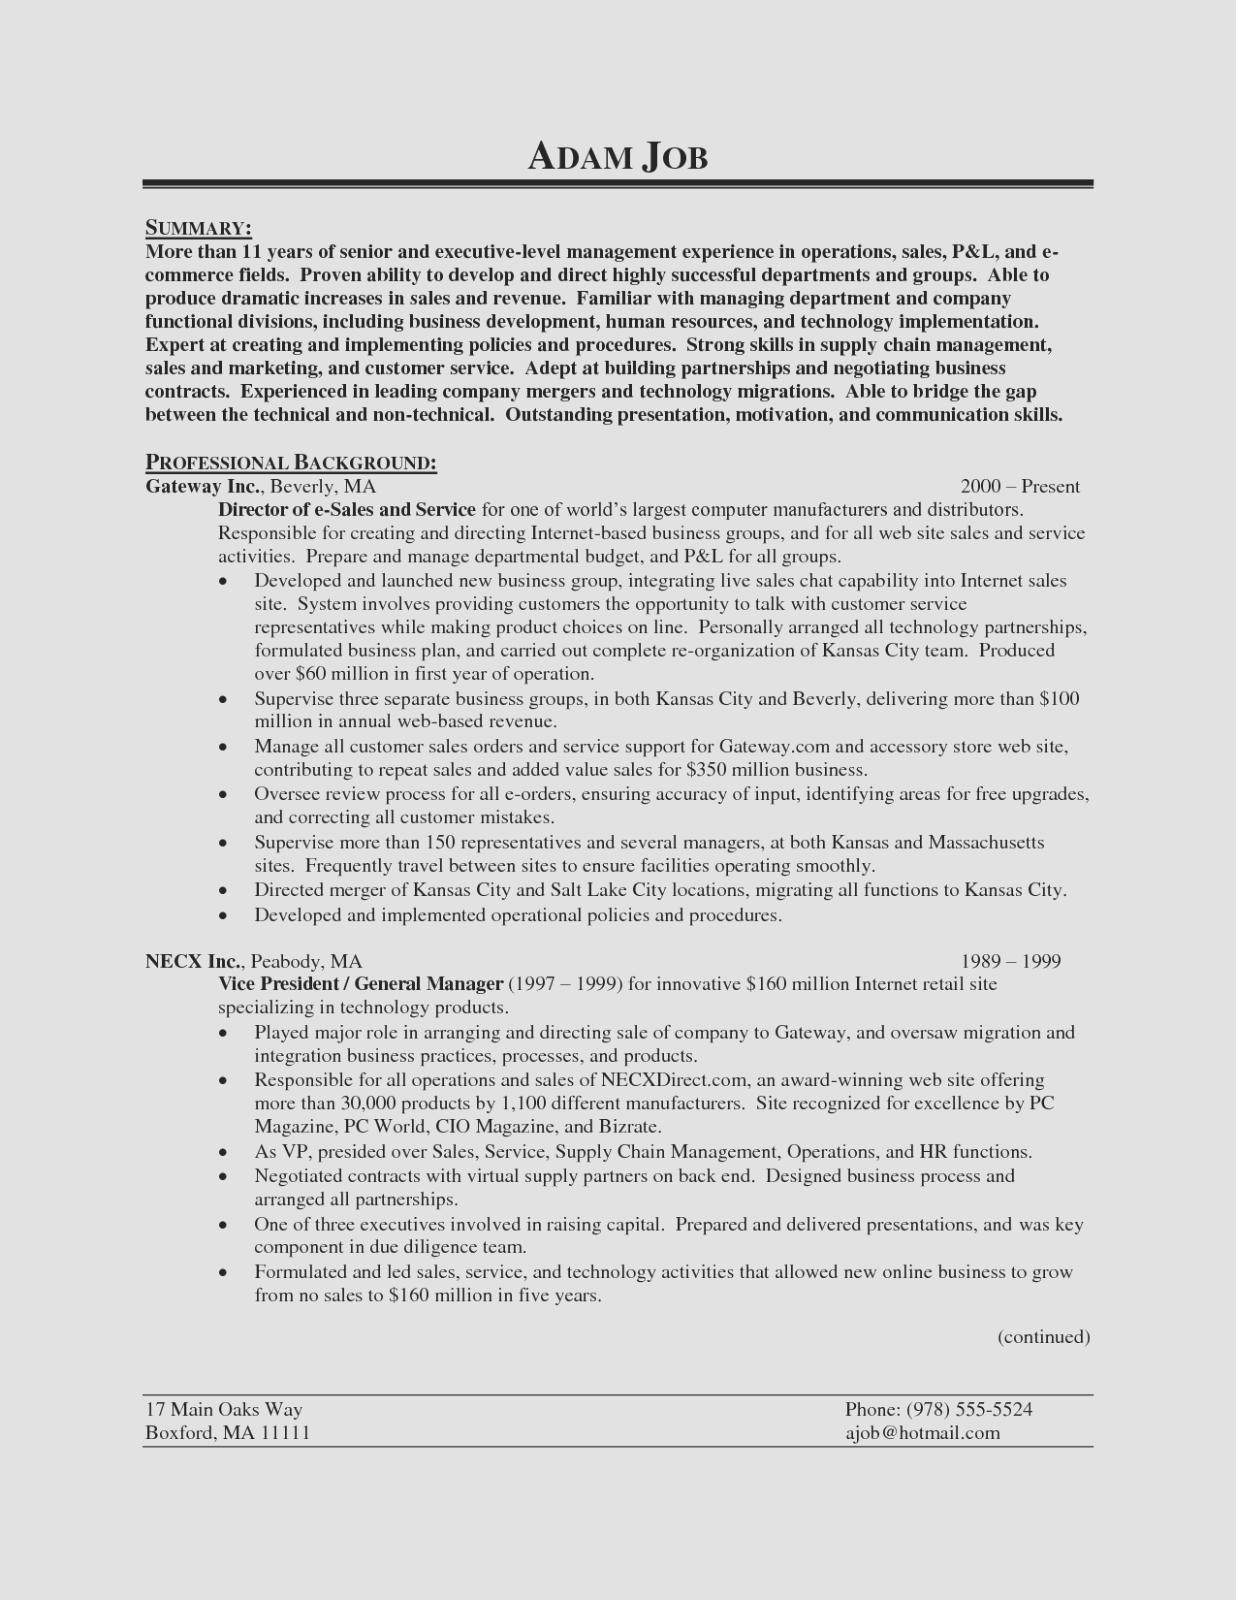 ob nurse resume objective 2019 ob nurse resume template 2020 ob nurse resume examples ob gyn nurse resume sample ob triage nurse resume registered nurse job resume ob student nurse resume ob nurse manager resume ob clinic nurse